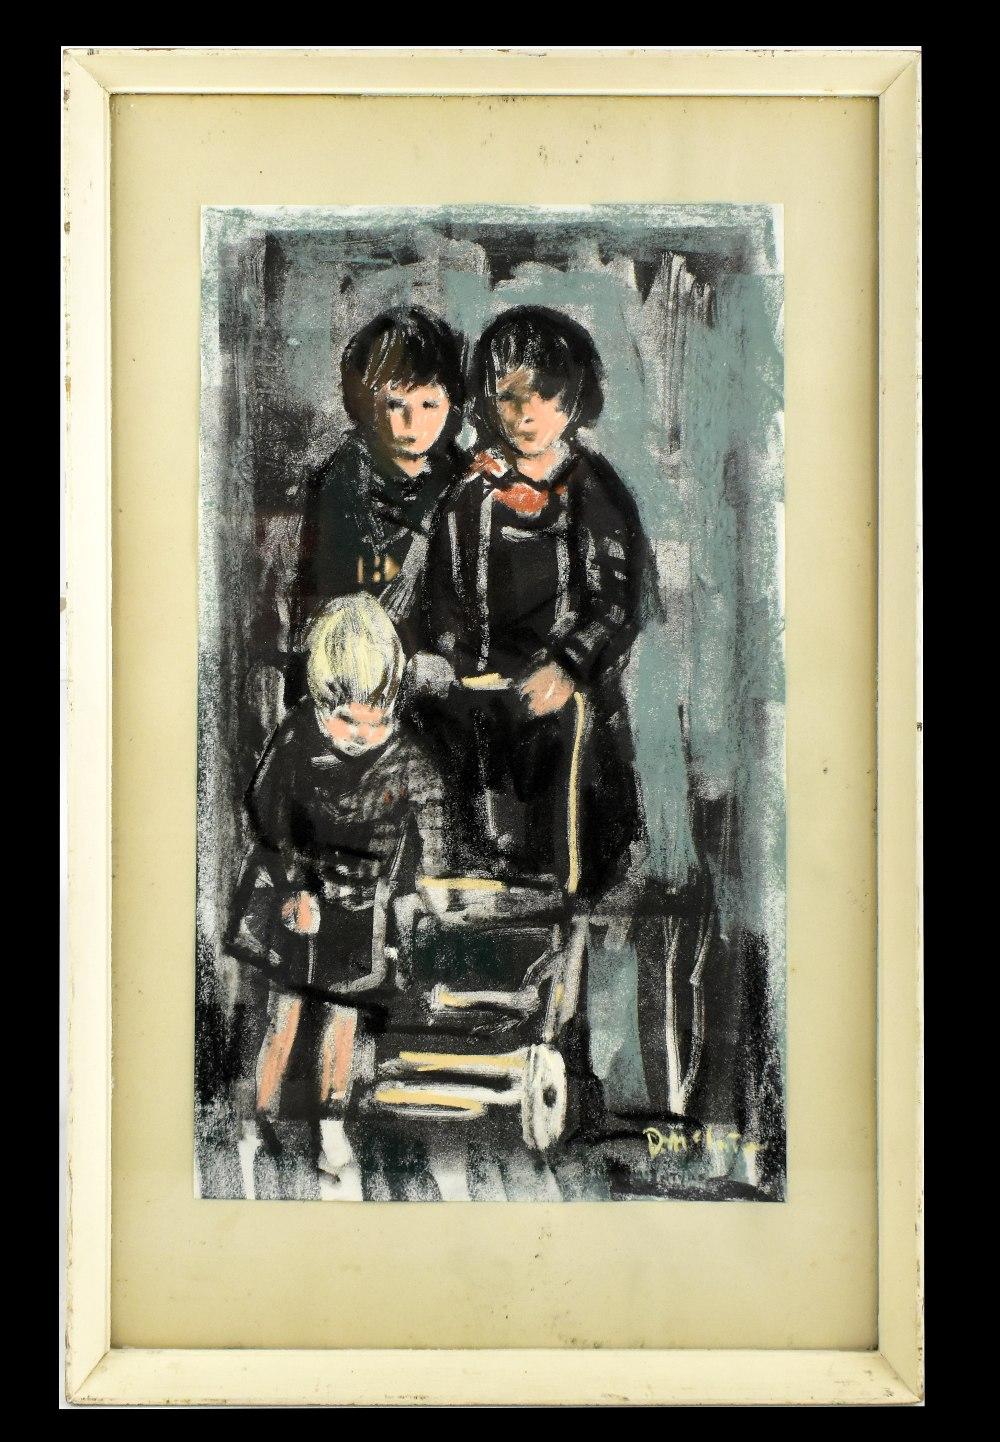 DONALD MCINTYRE (1923-2009); monoprint with pastel highlights, 'Children & Pram', bears letter